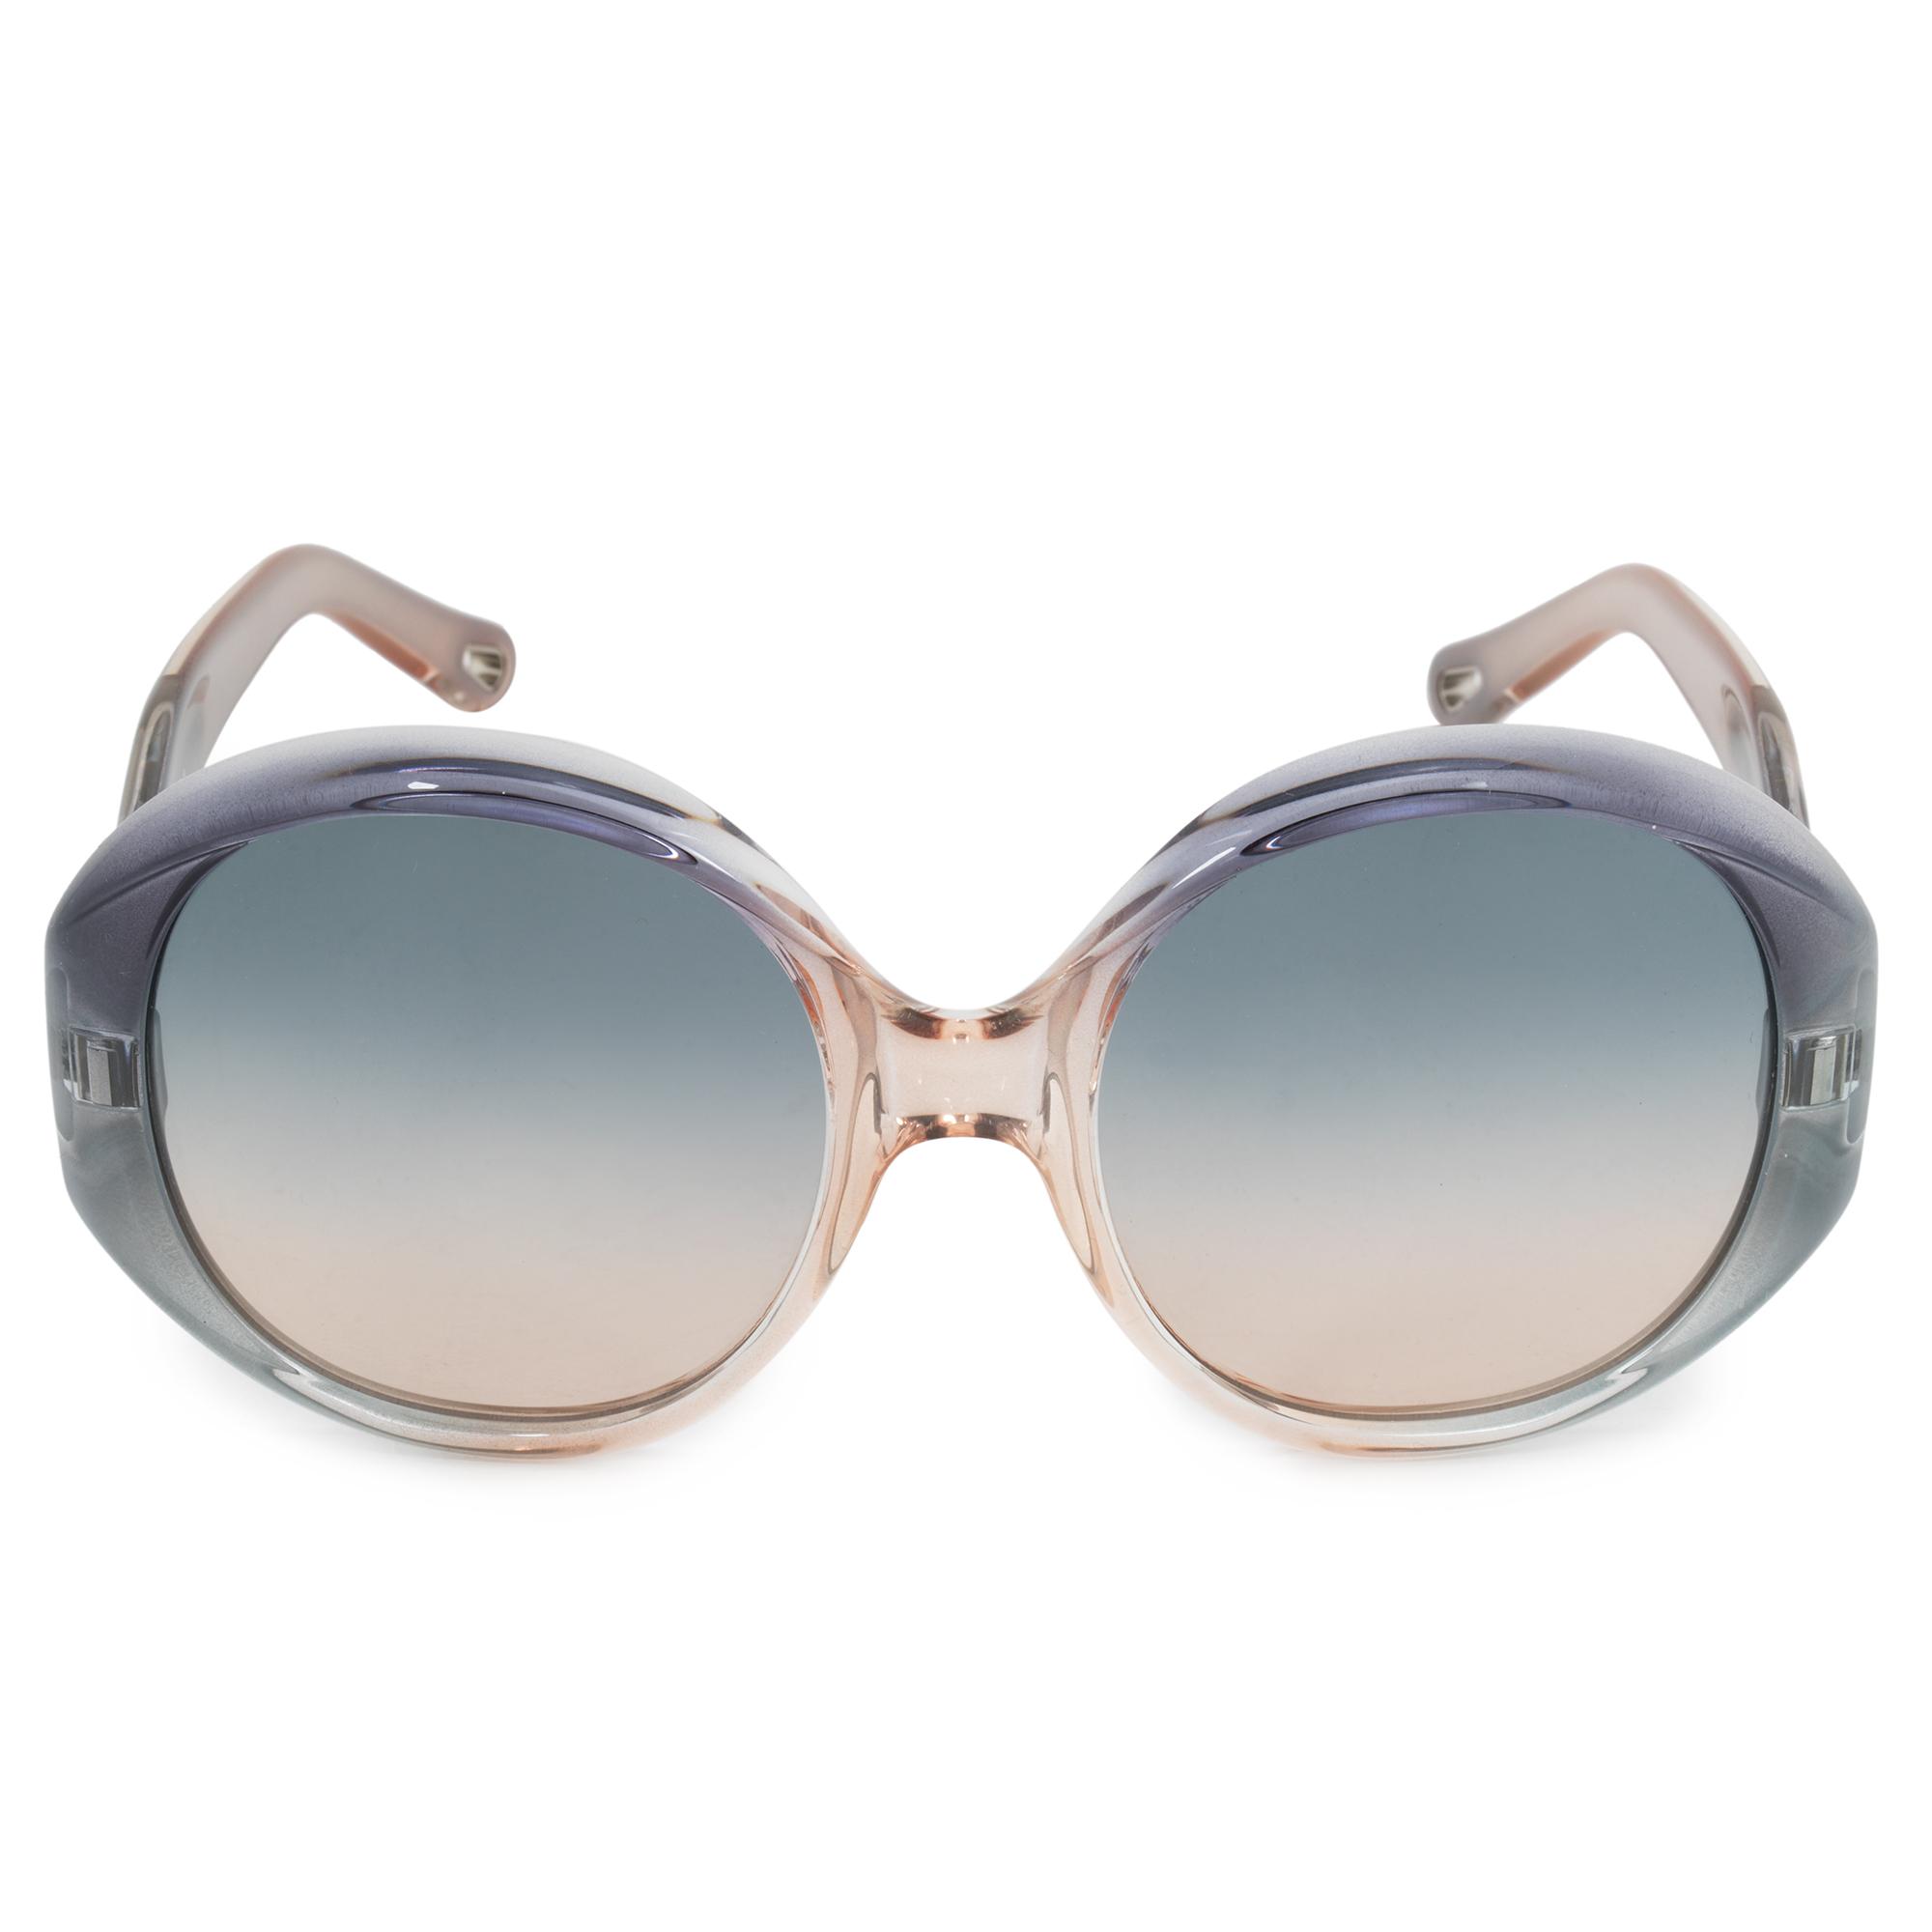 560c54d8867 Chloe Oval Sunglasses CE732S 037 57